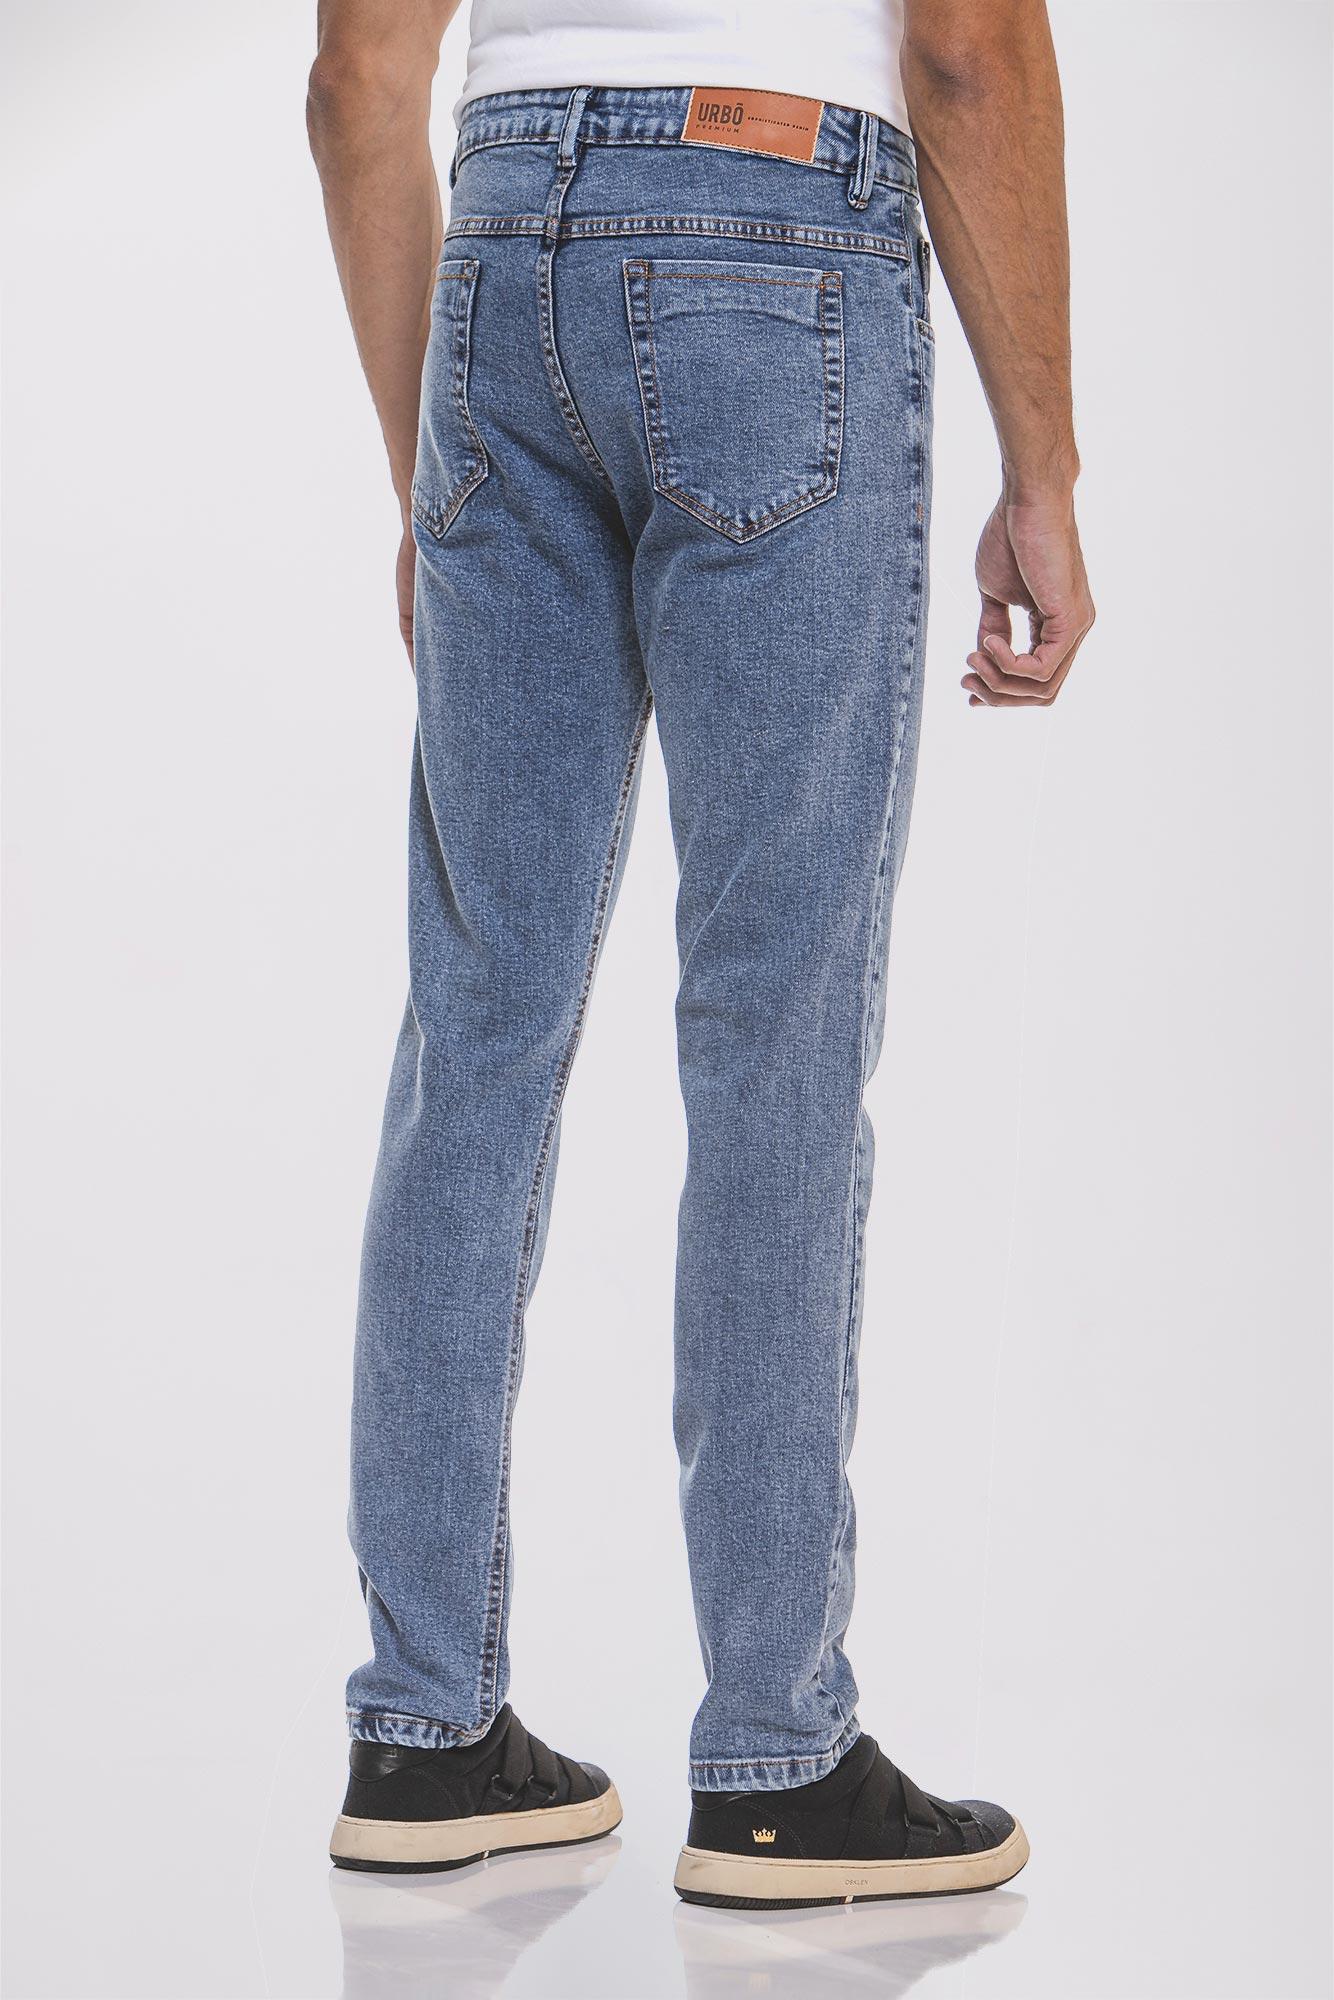 Calça Jeans New Age Blue